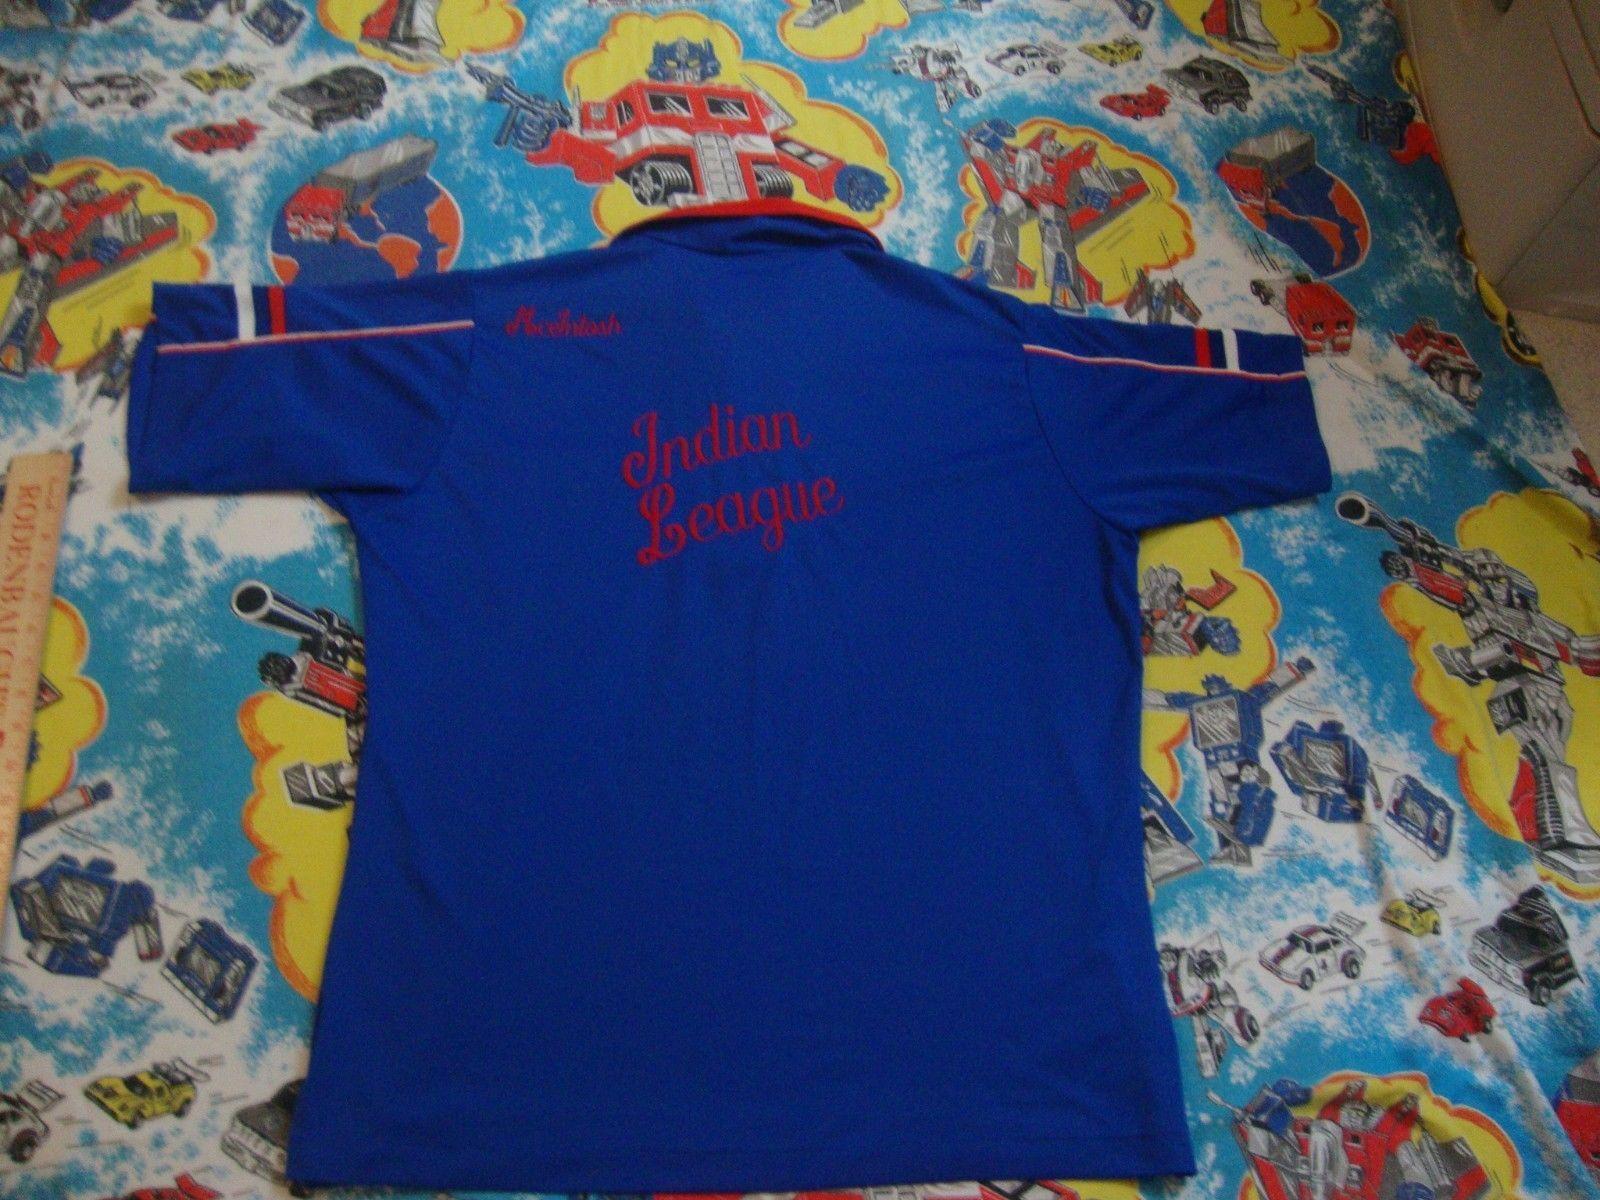 Vintage 80s Indian League McIntosh Bowling Polyester Hilton Blue Pocket Shirt XL